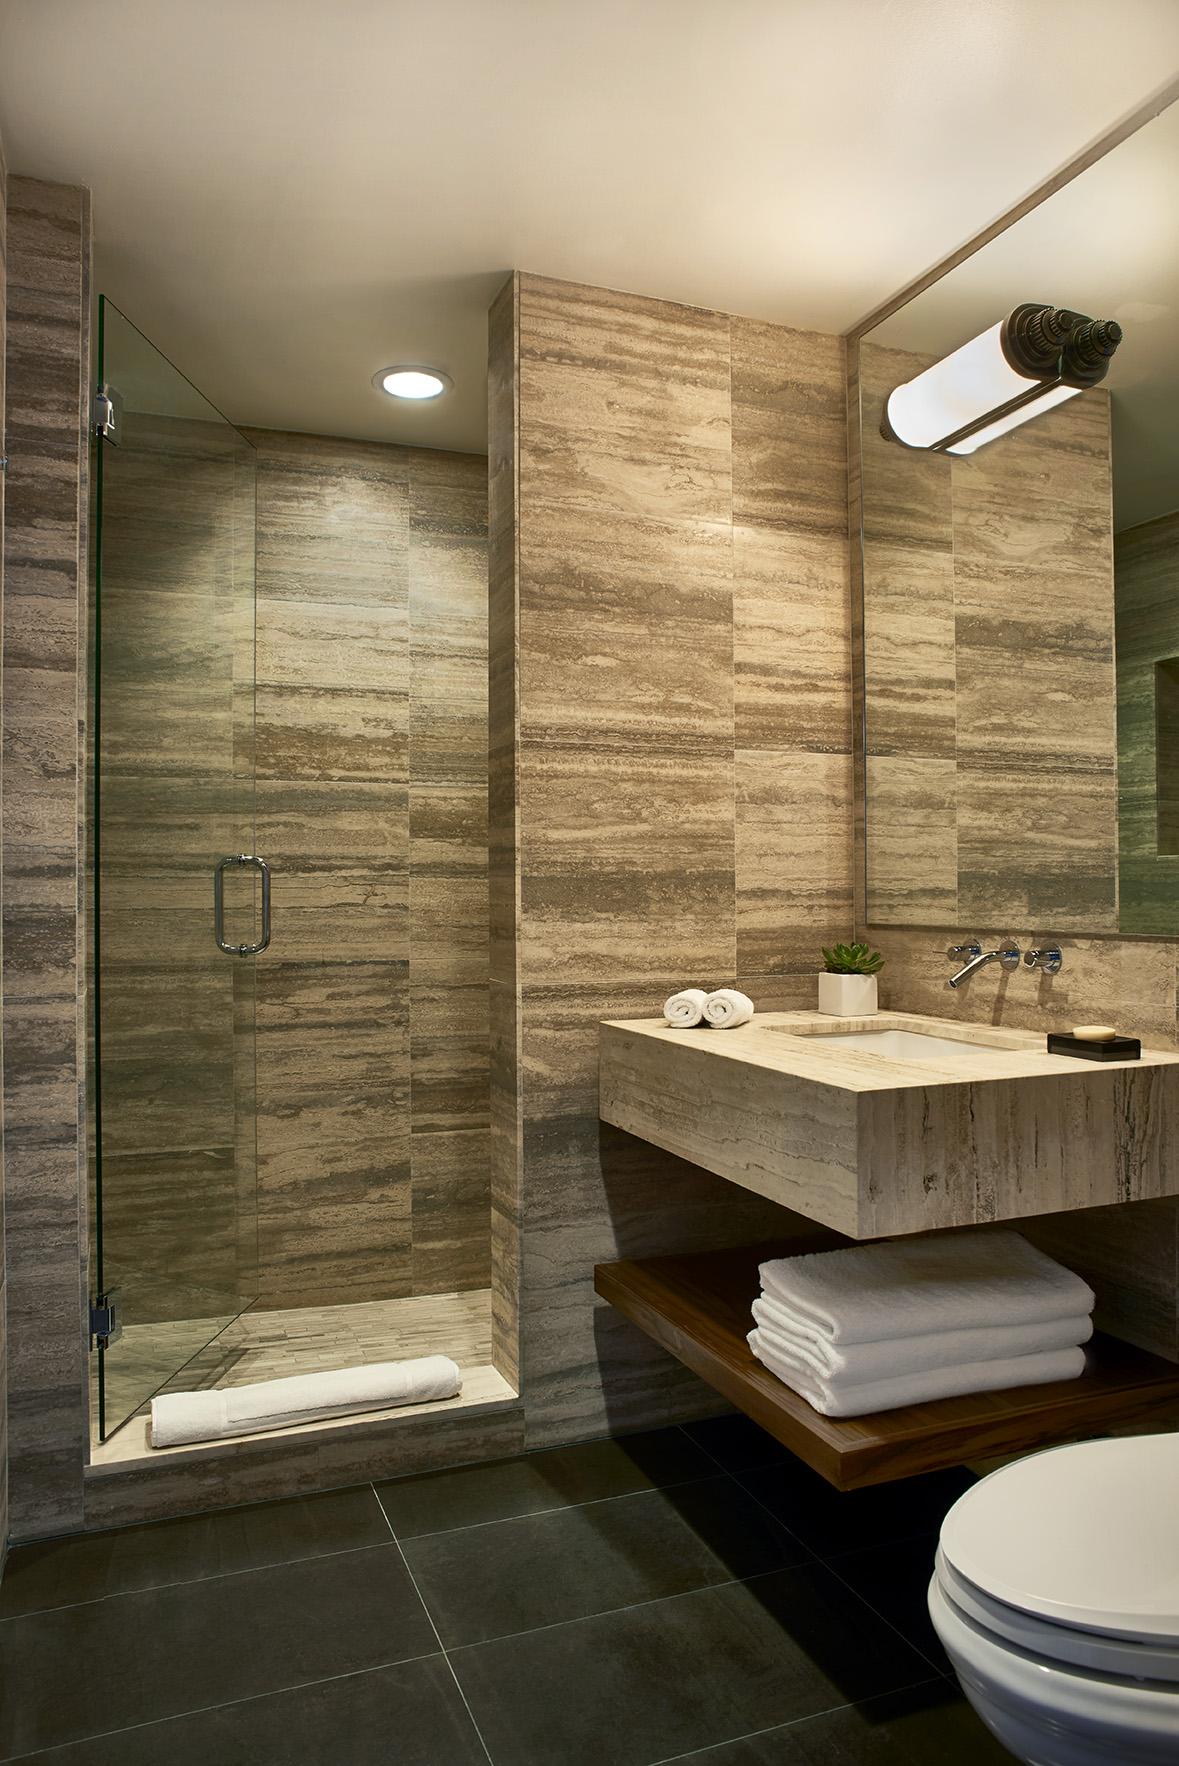 Nautilus-Penthouse-Bathroom.jpg